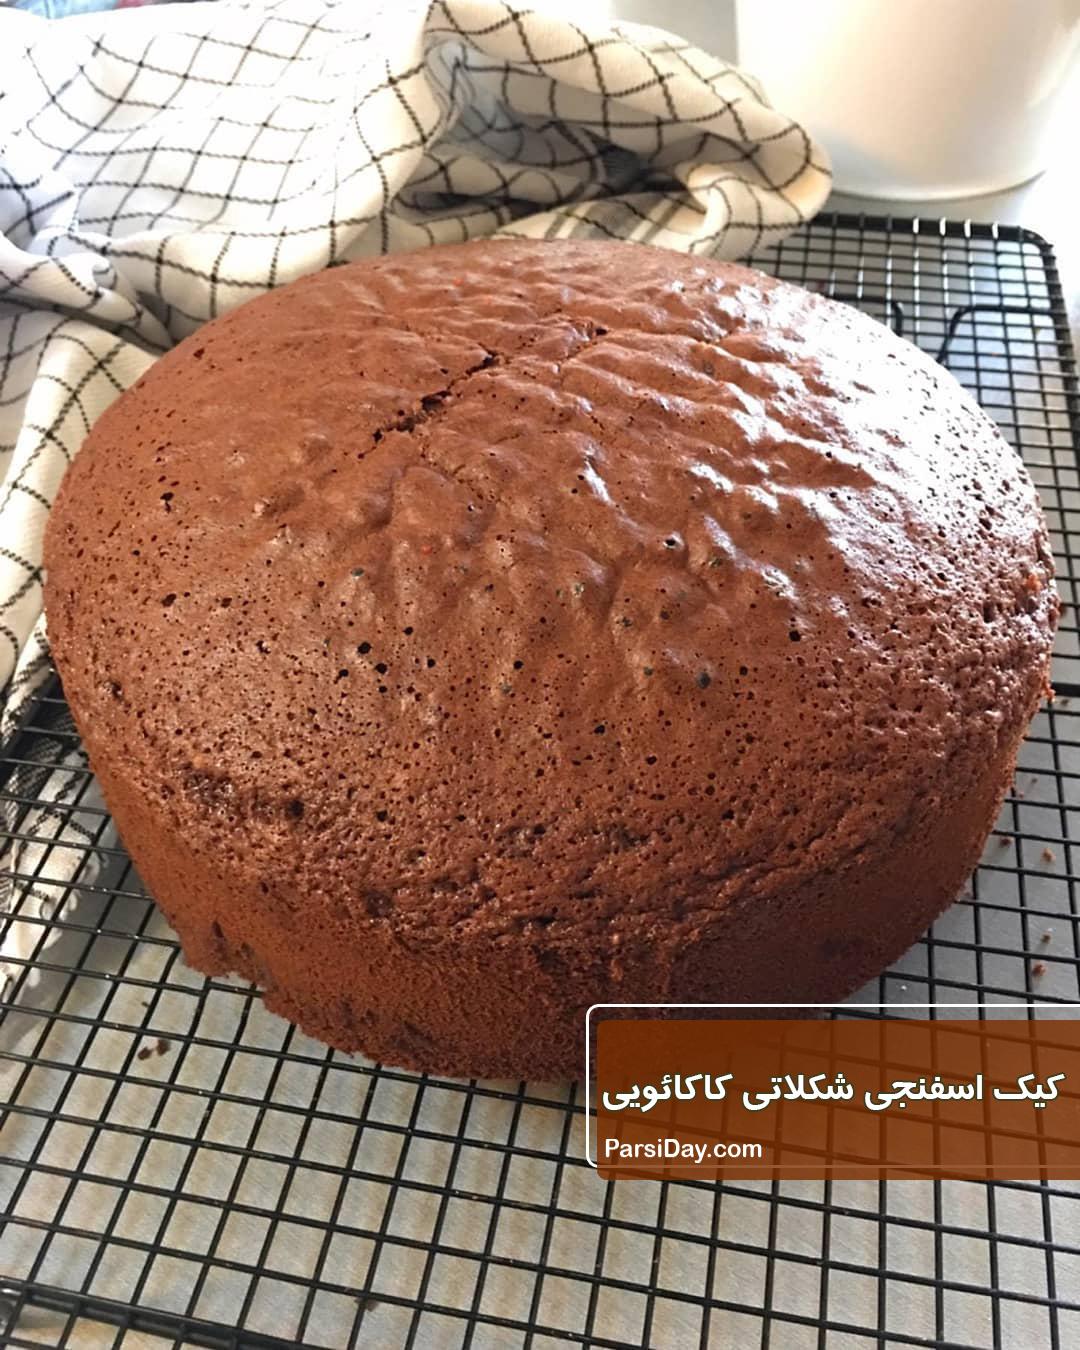 طرز تهیه کیک اسفنجی شکلاتی کاکائویی